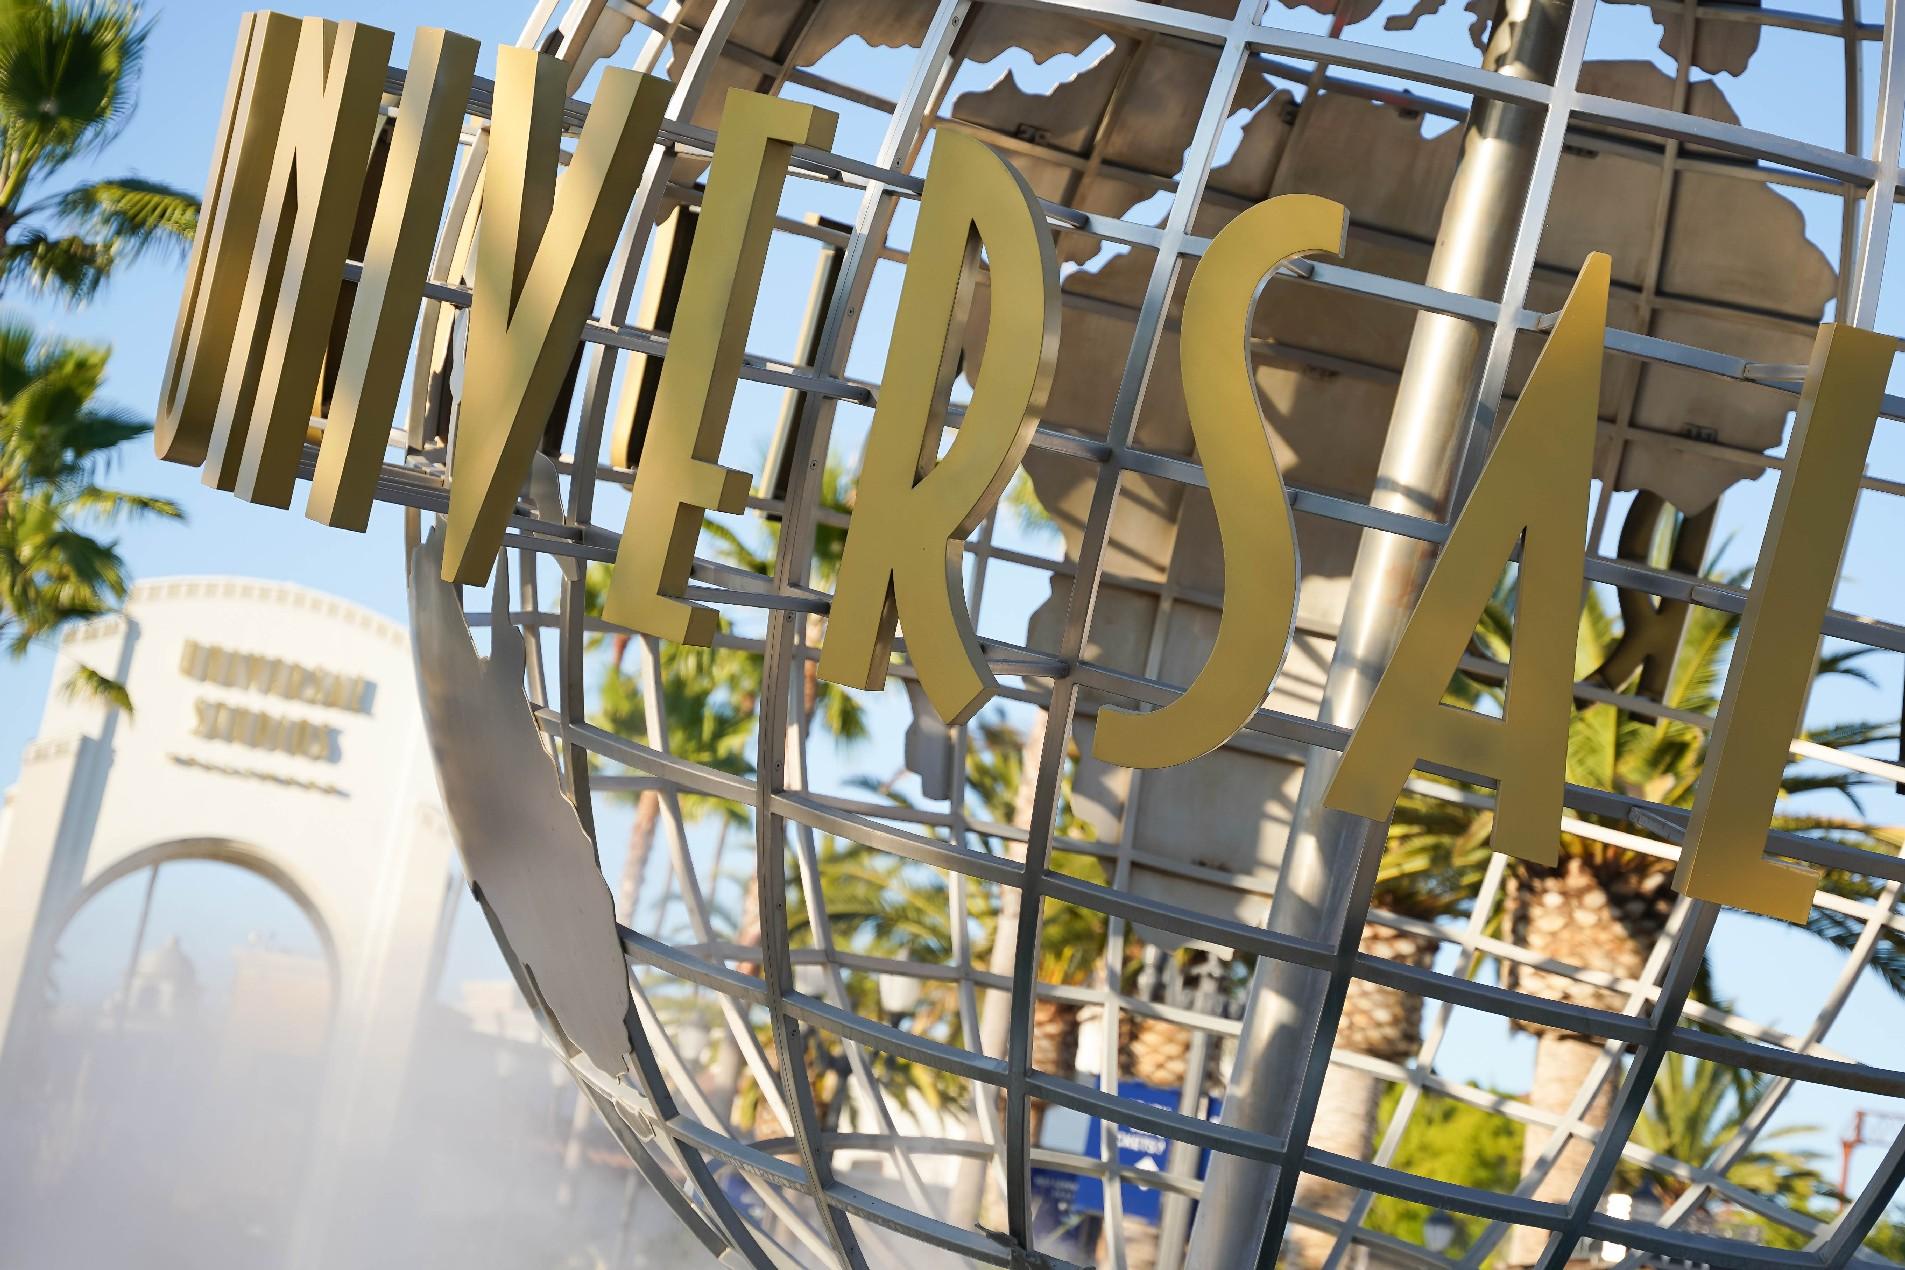 www.insideuniversal.net